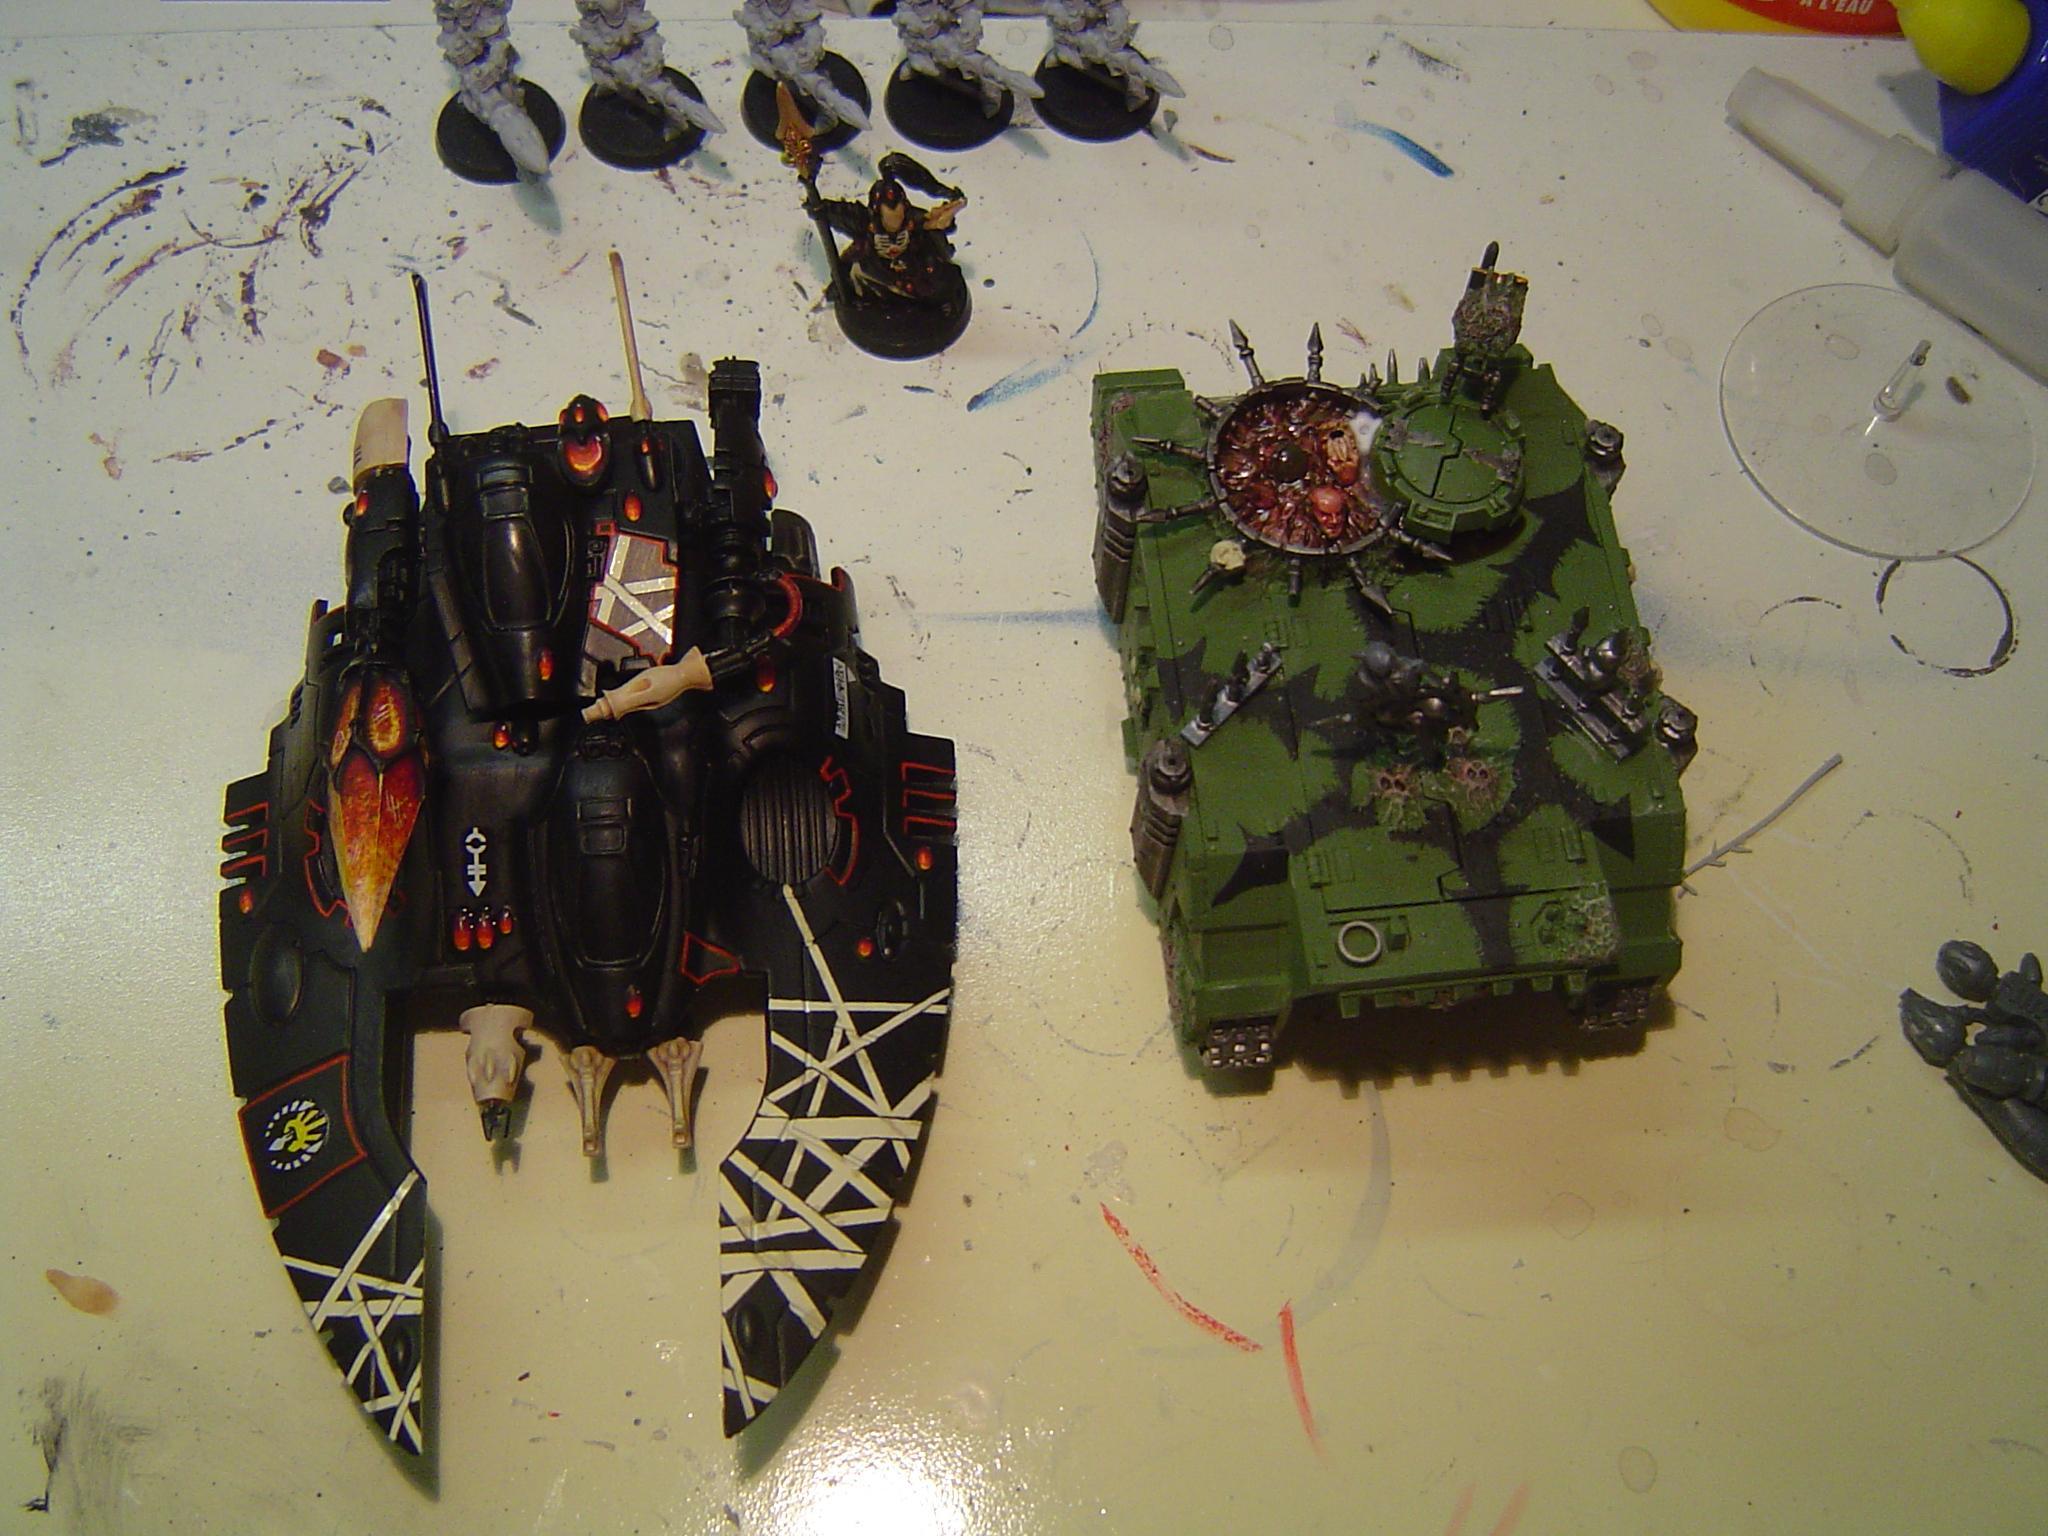 Eldar, Fire Prism, Gloss Varnish, Snow, Ulthwe, Warhammer 40,000, Winter, Wraithlord